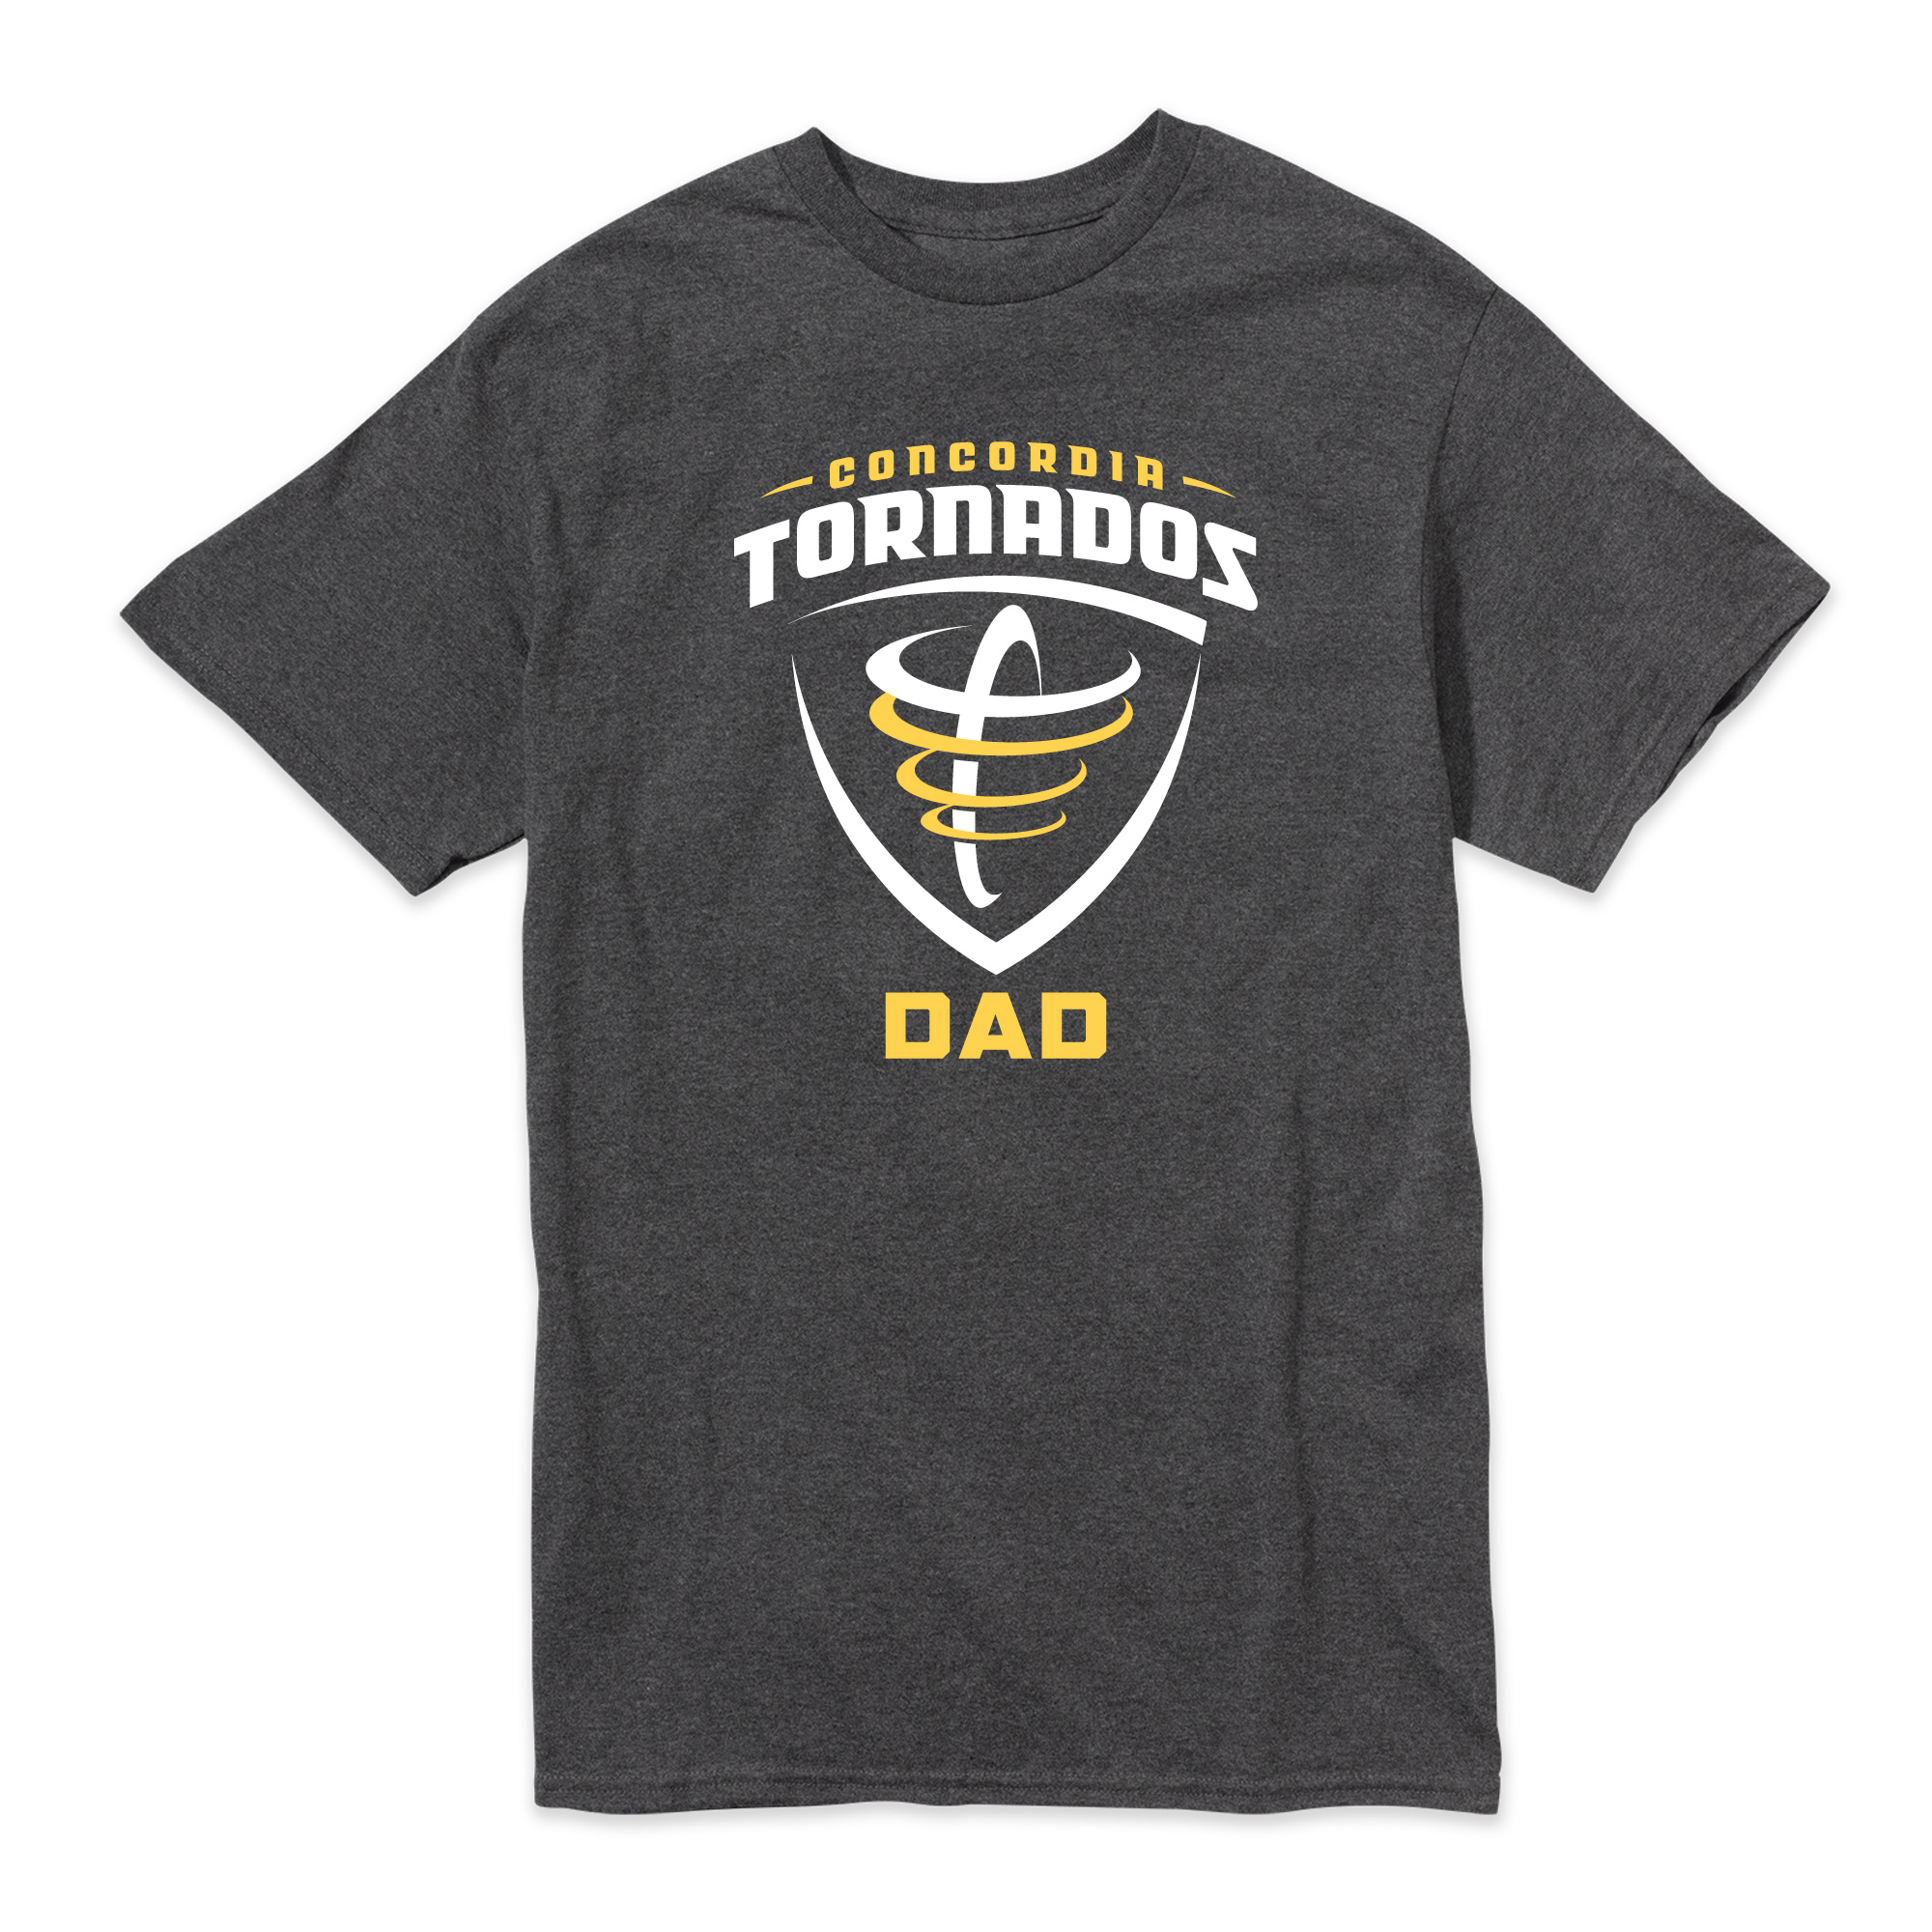 Concordia Torados Dad Tee - Charcoal Heather